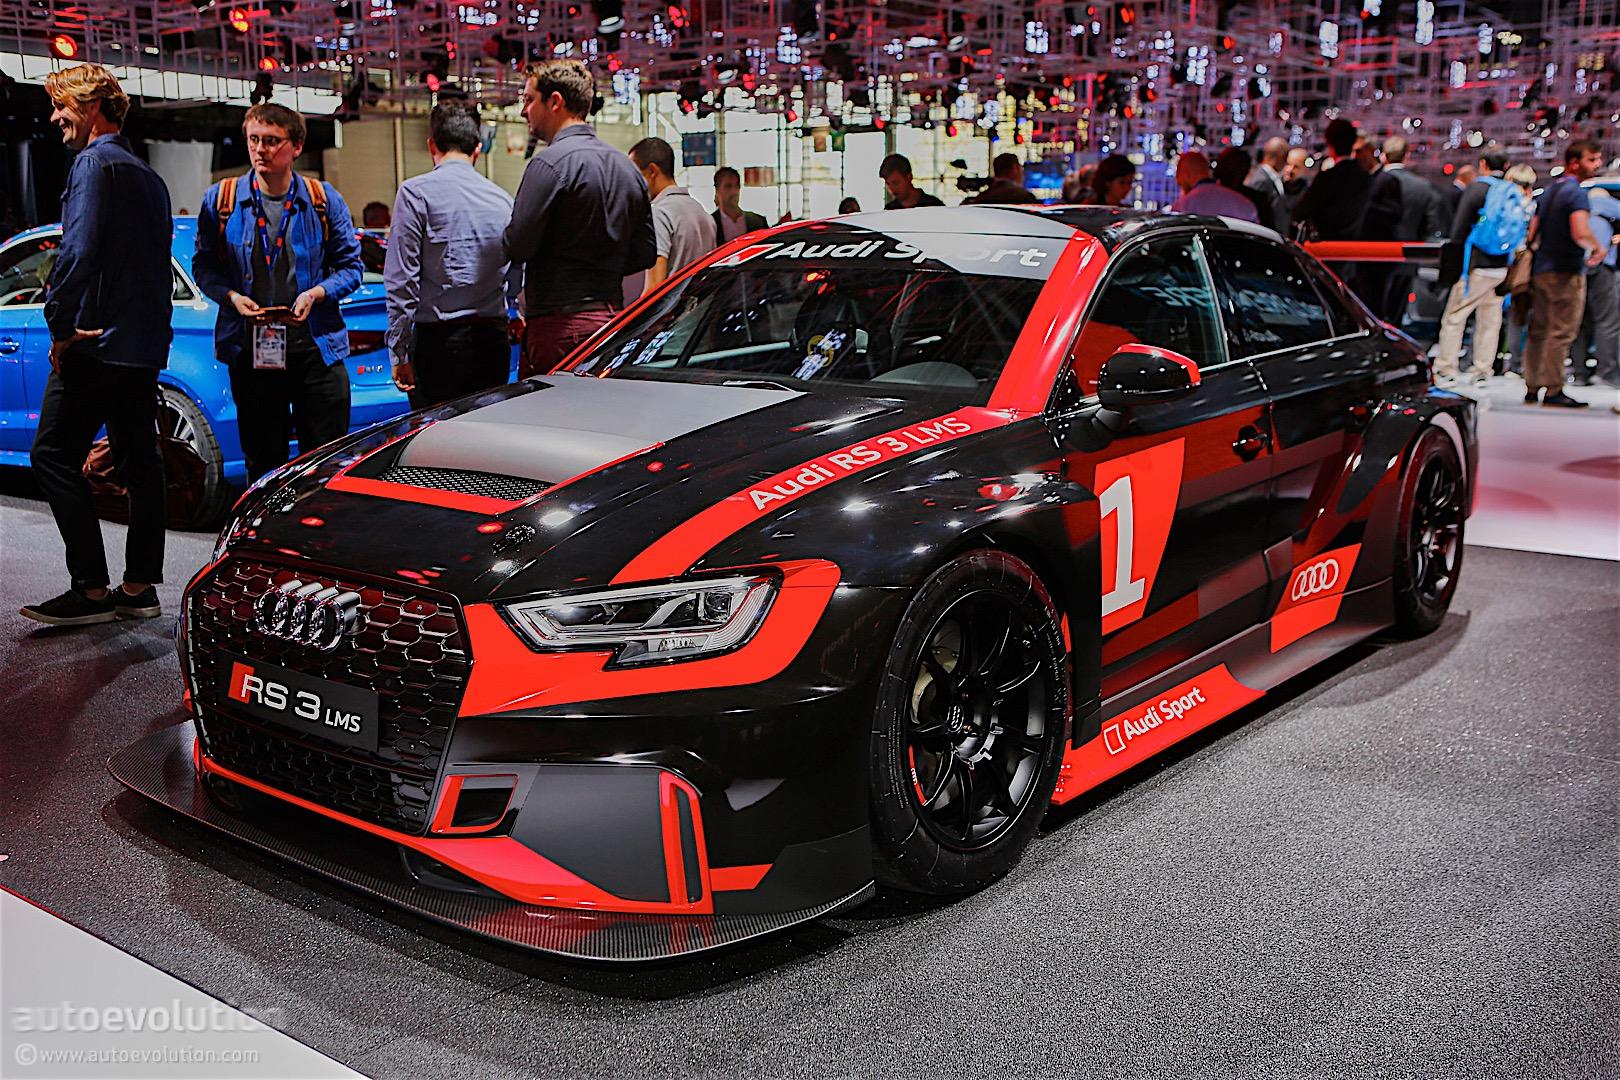 Audi Rs3 Gets Racing Version Becomes Audi Rs3 Lms 111715on Audi S3 Sedan